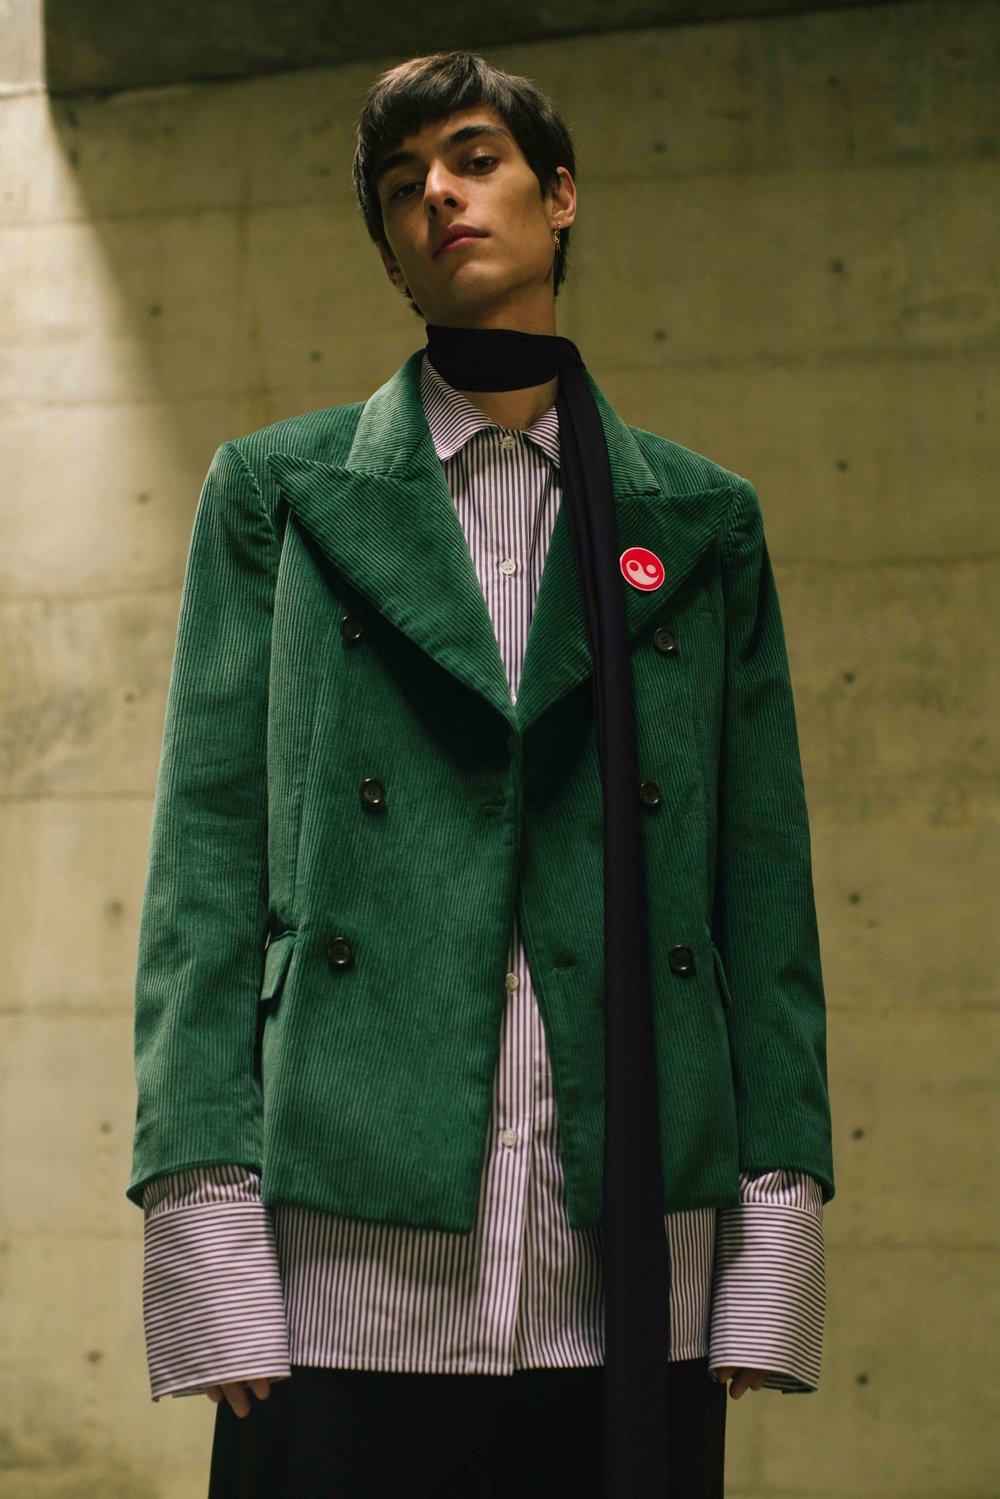 Green Corduroy Jacket  GOSHA RUBCHINSKYI  Shirt  DELADA  Scarf  VICTOR VON SCHWARZ   Pants  RAF SIMONS